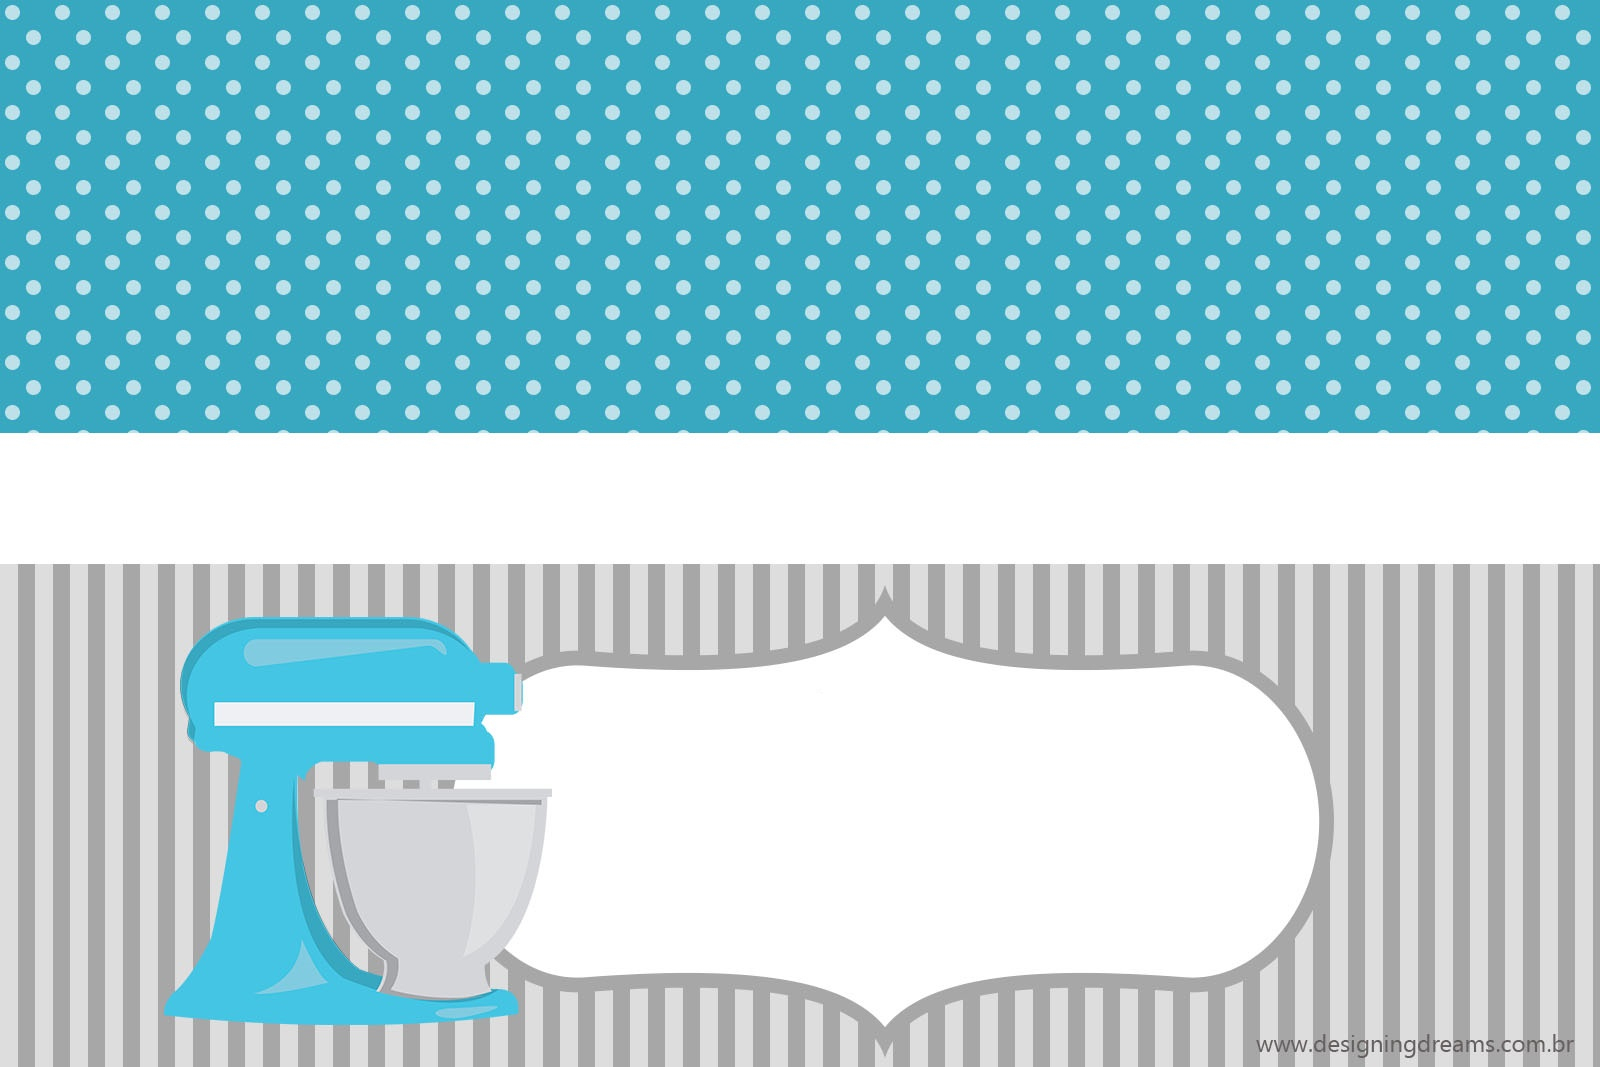 Baking In Blue: Free Printable Kit. | Oh My Fiesta For Ladies! - Free Printable Baking Labels